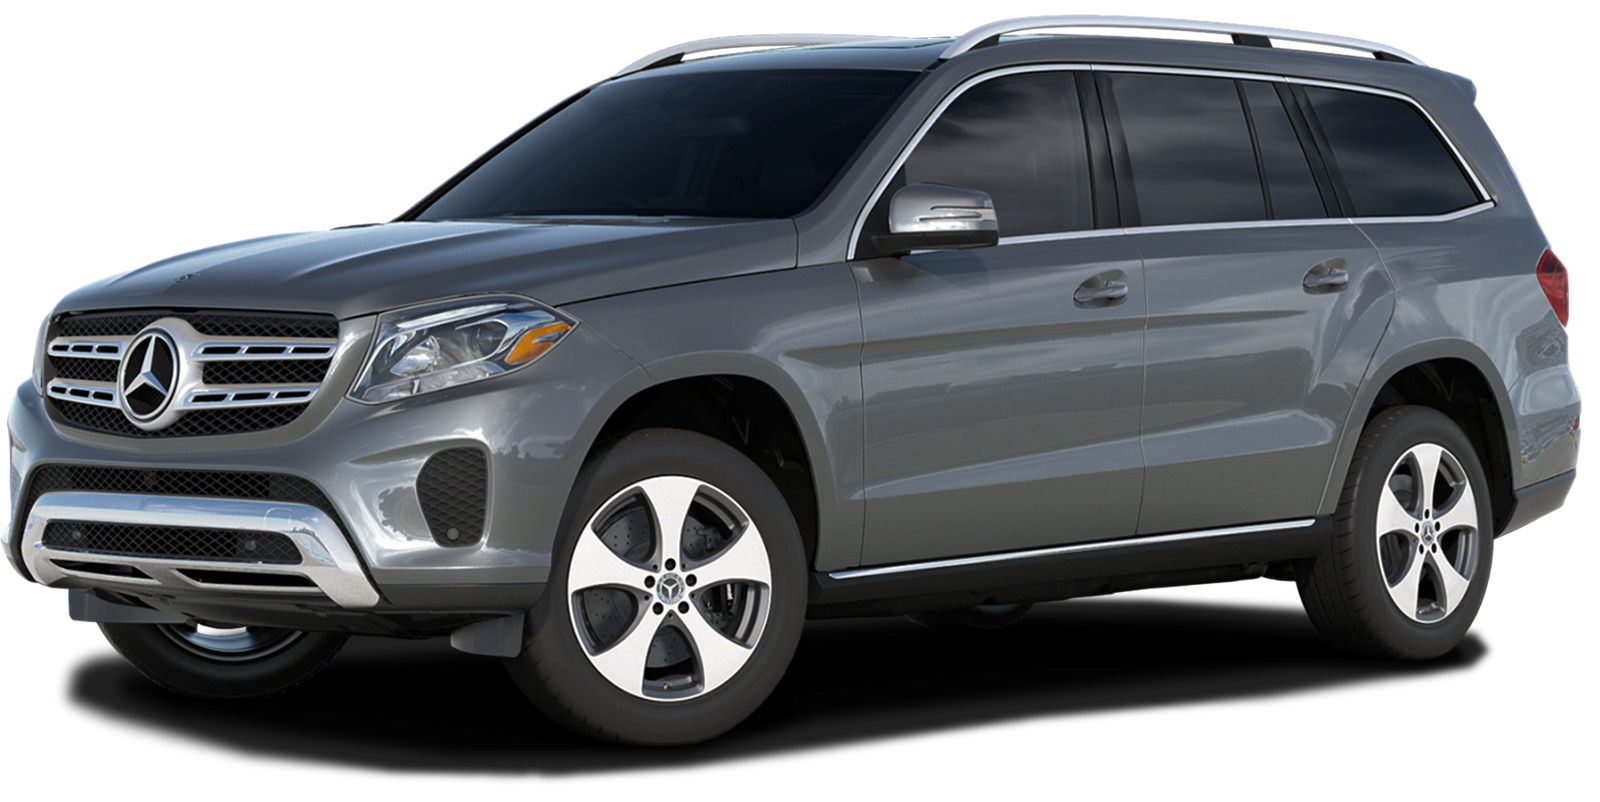 2019 Mercedes Benz Gls 450 Incentives Specials Offers In Fort Lauderdale Fl